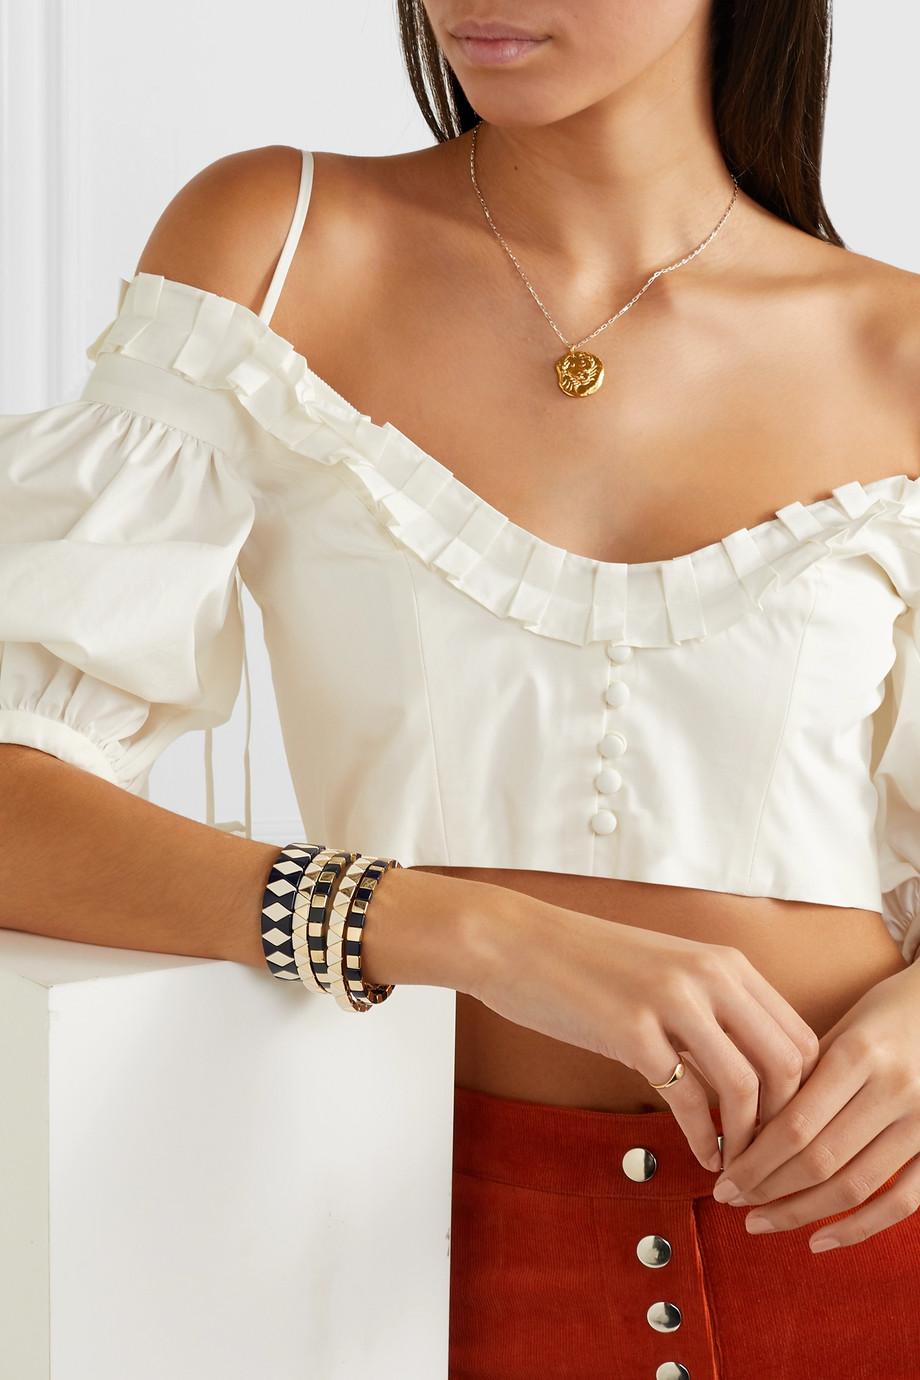 Roxanne Assoulin Suit Yourself 搪瓷金色手链(五只装)